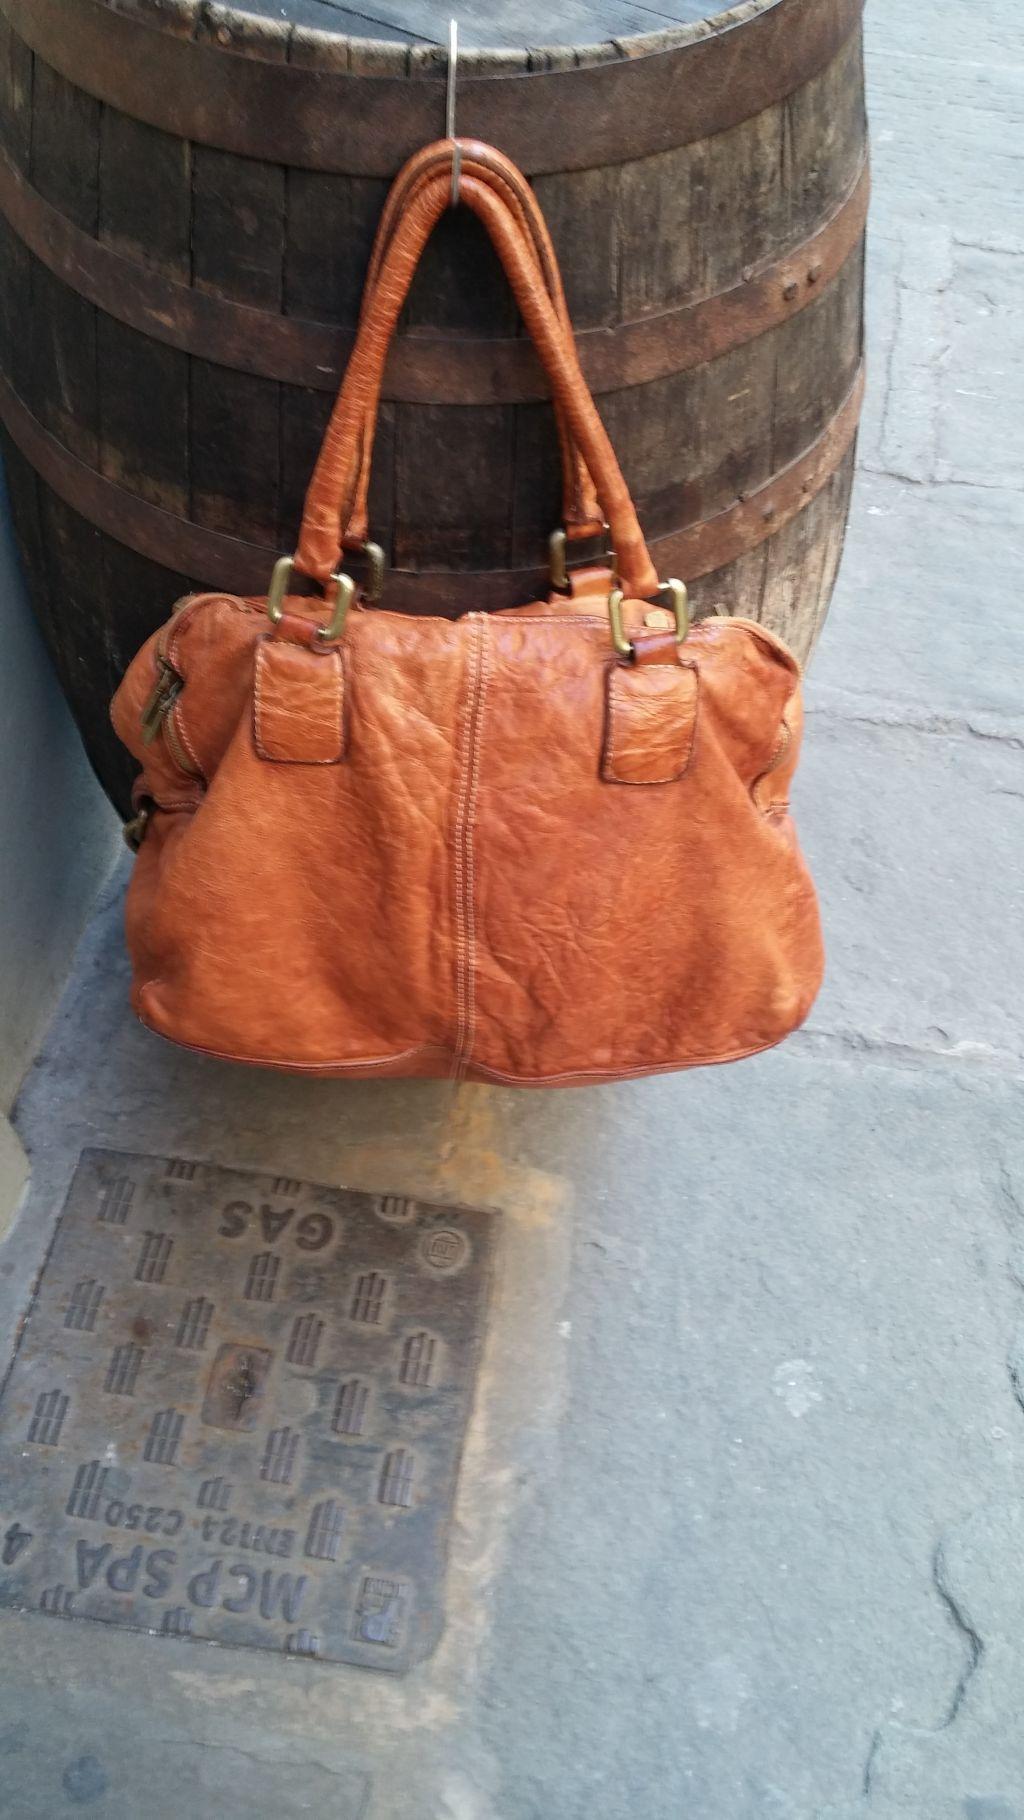 a929663eee95e FL2025 BORSA A SPALLA TRE ZIP - Florence Leather House